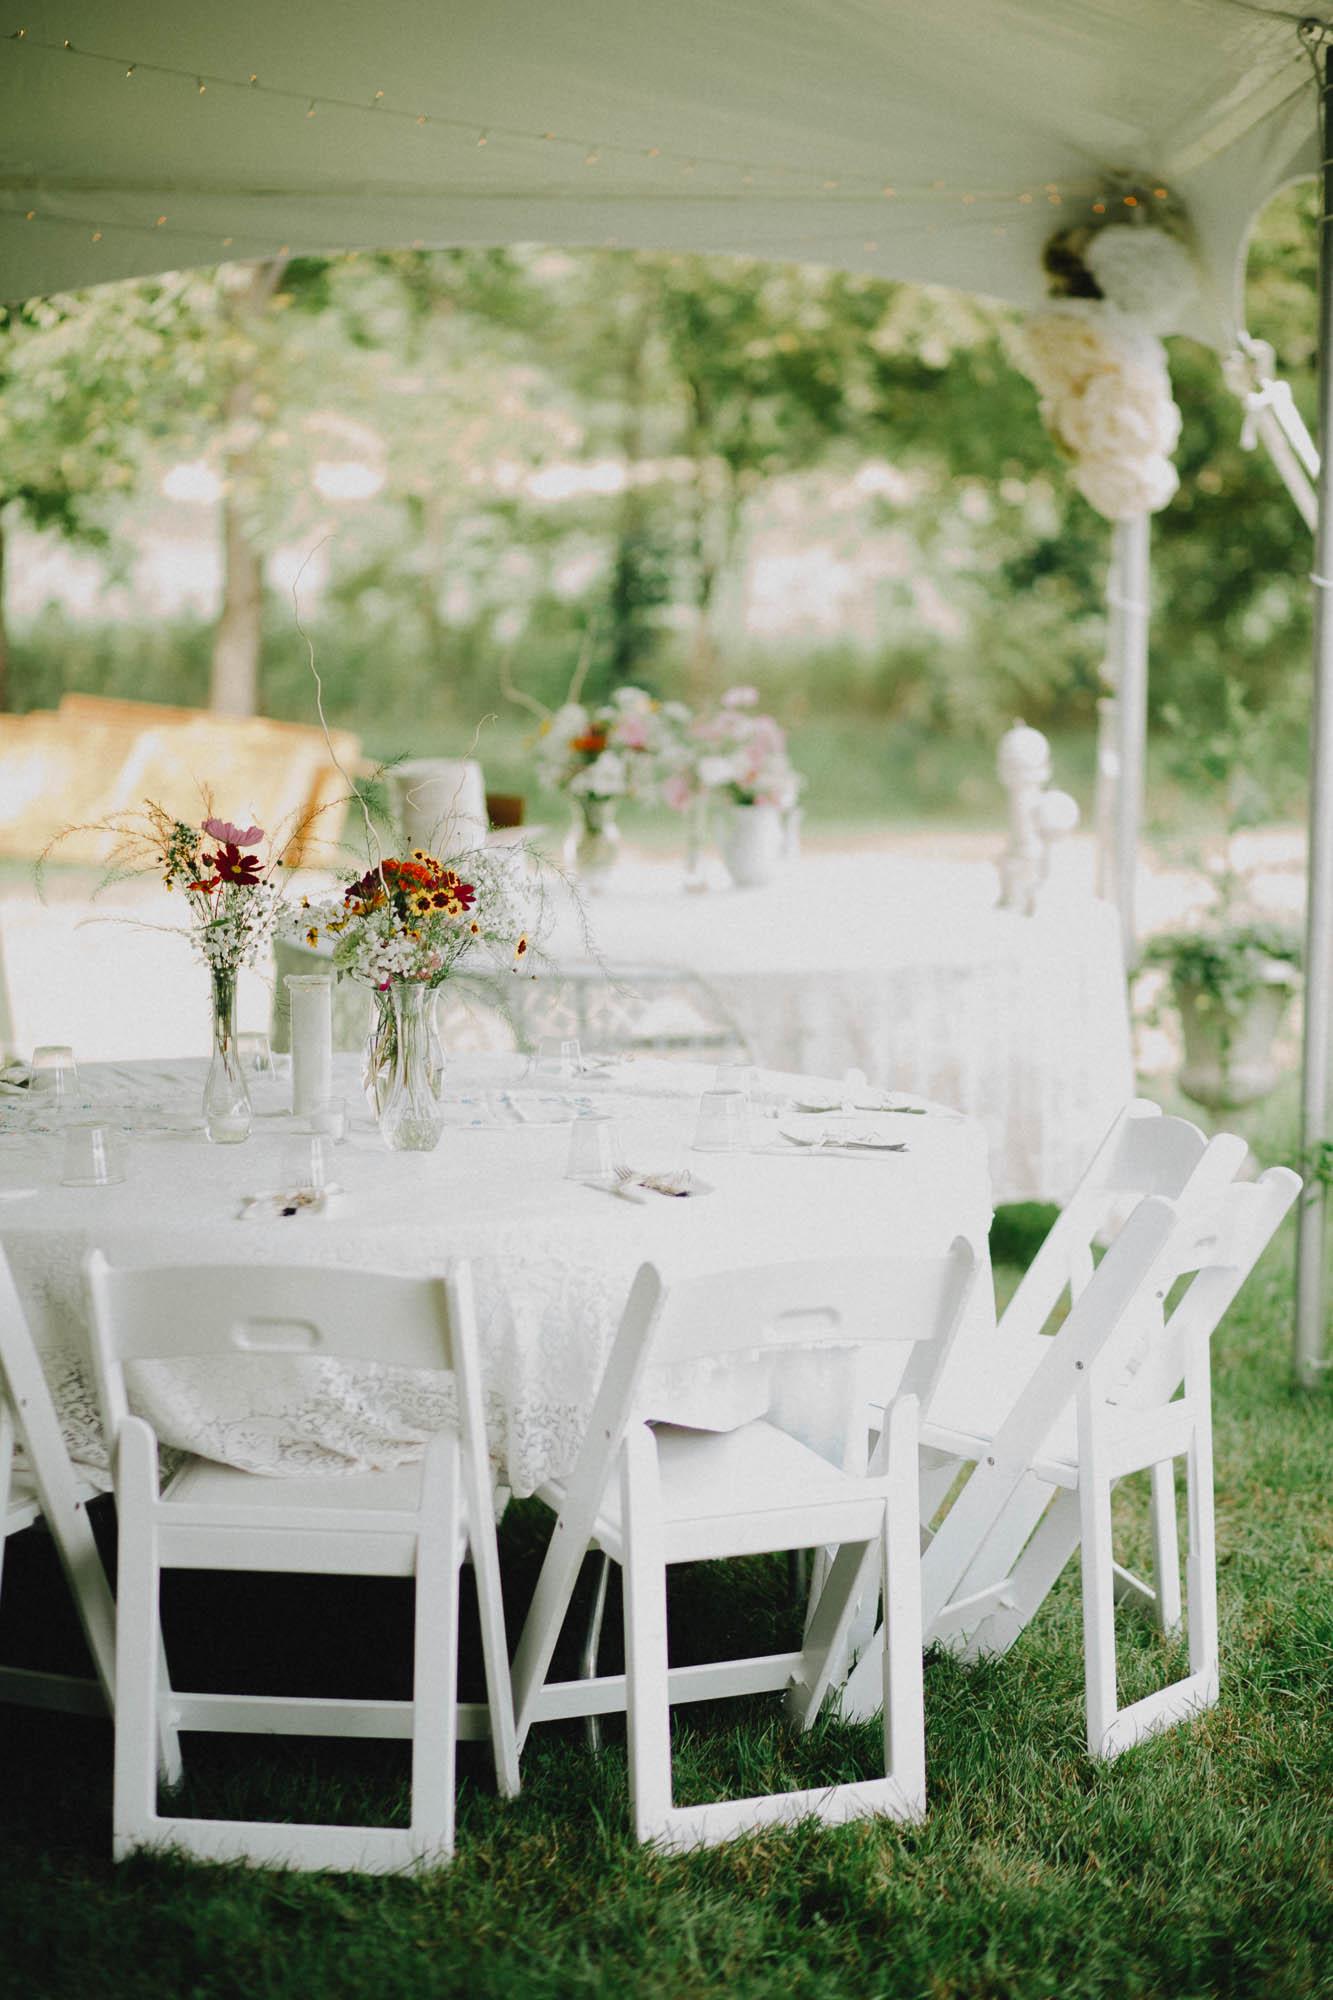 Leah-Graham-Outdoor-DIY-Michigan-Wedding-Details-008@2x.jpg